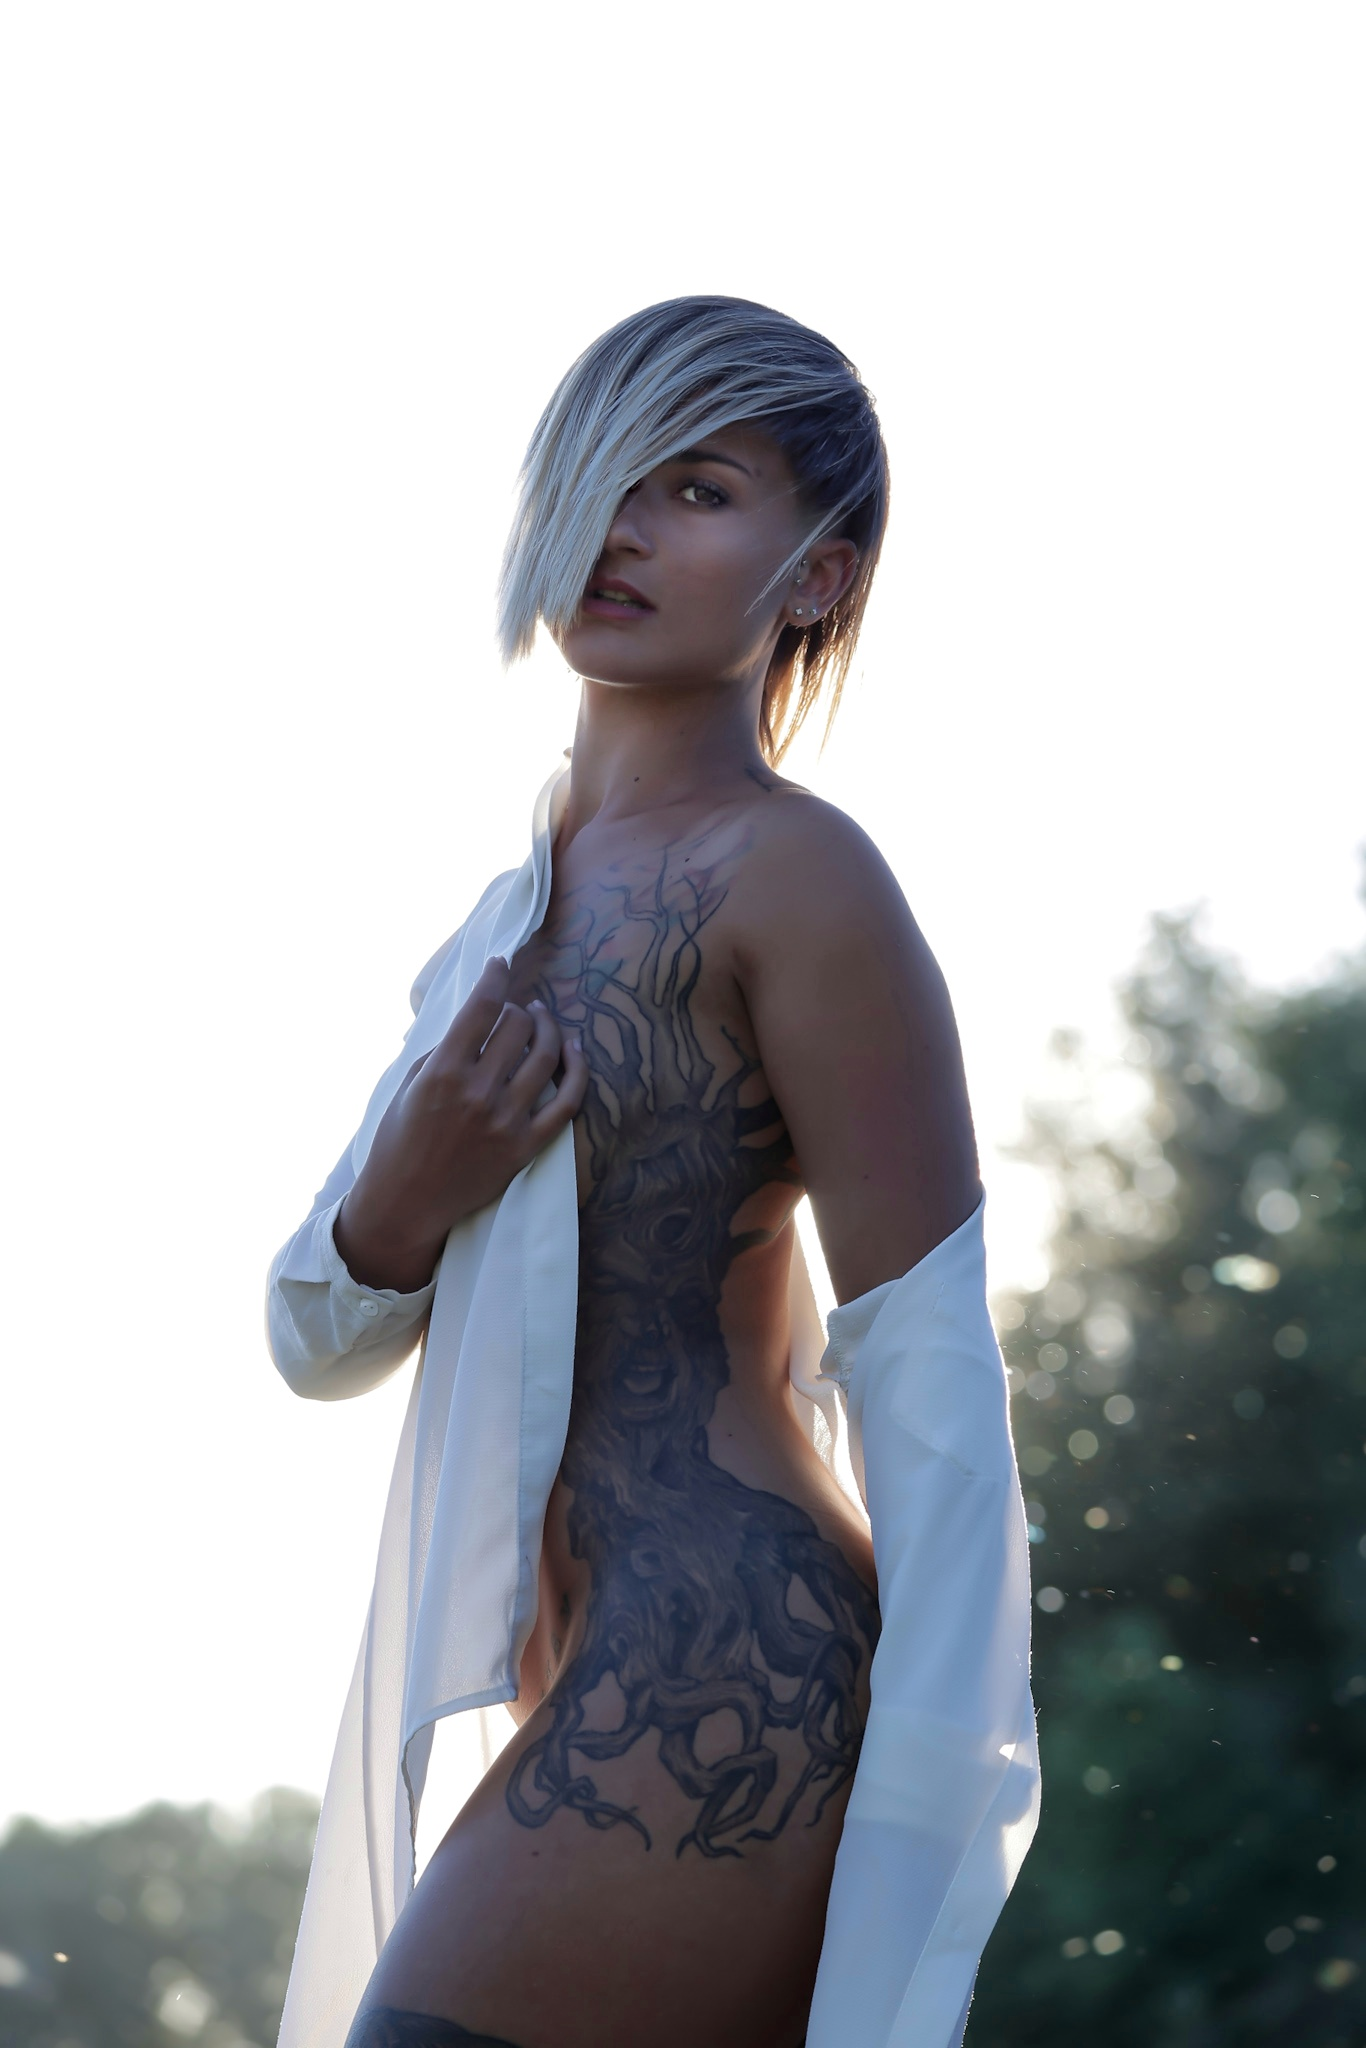 Categorie: Boudoir & Nude, Glamour, Portrait; Photographer: SARA GENTILI; Model: VIRGINIA DAIMON; Location: Stimigliano, RI, Italia